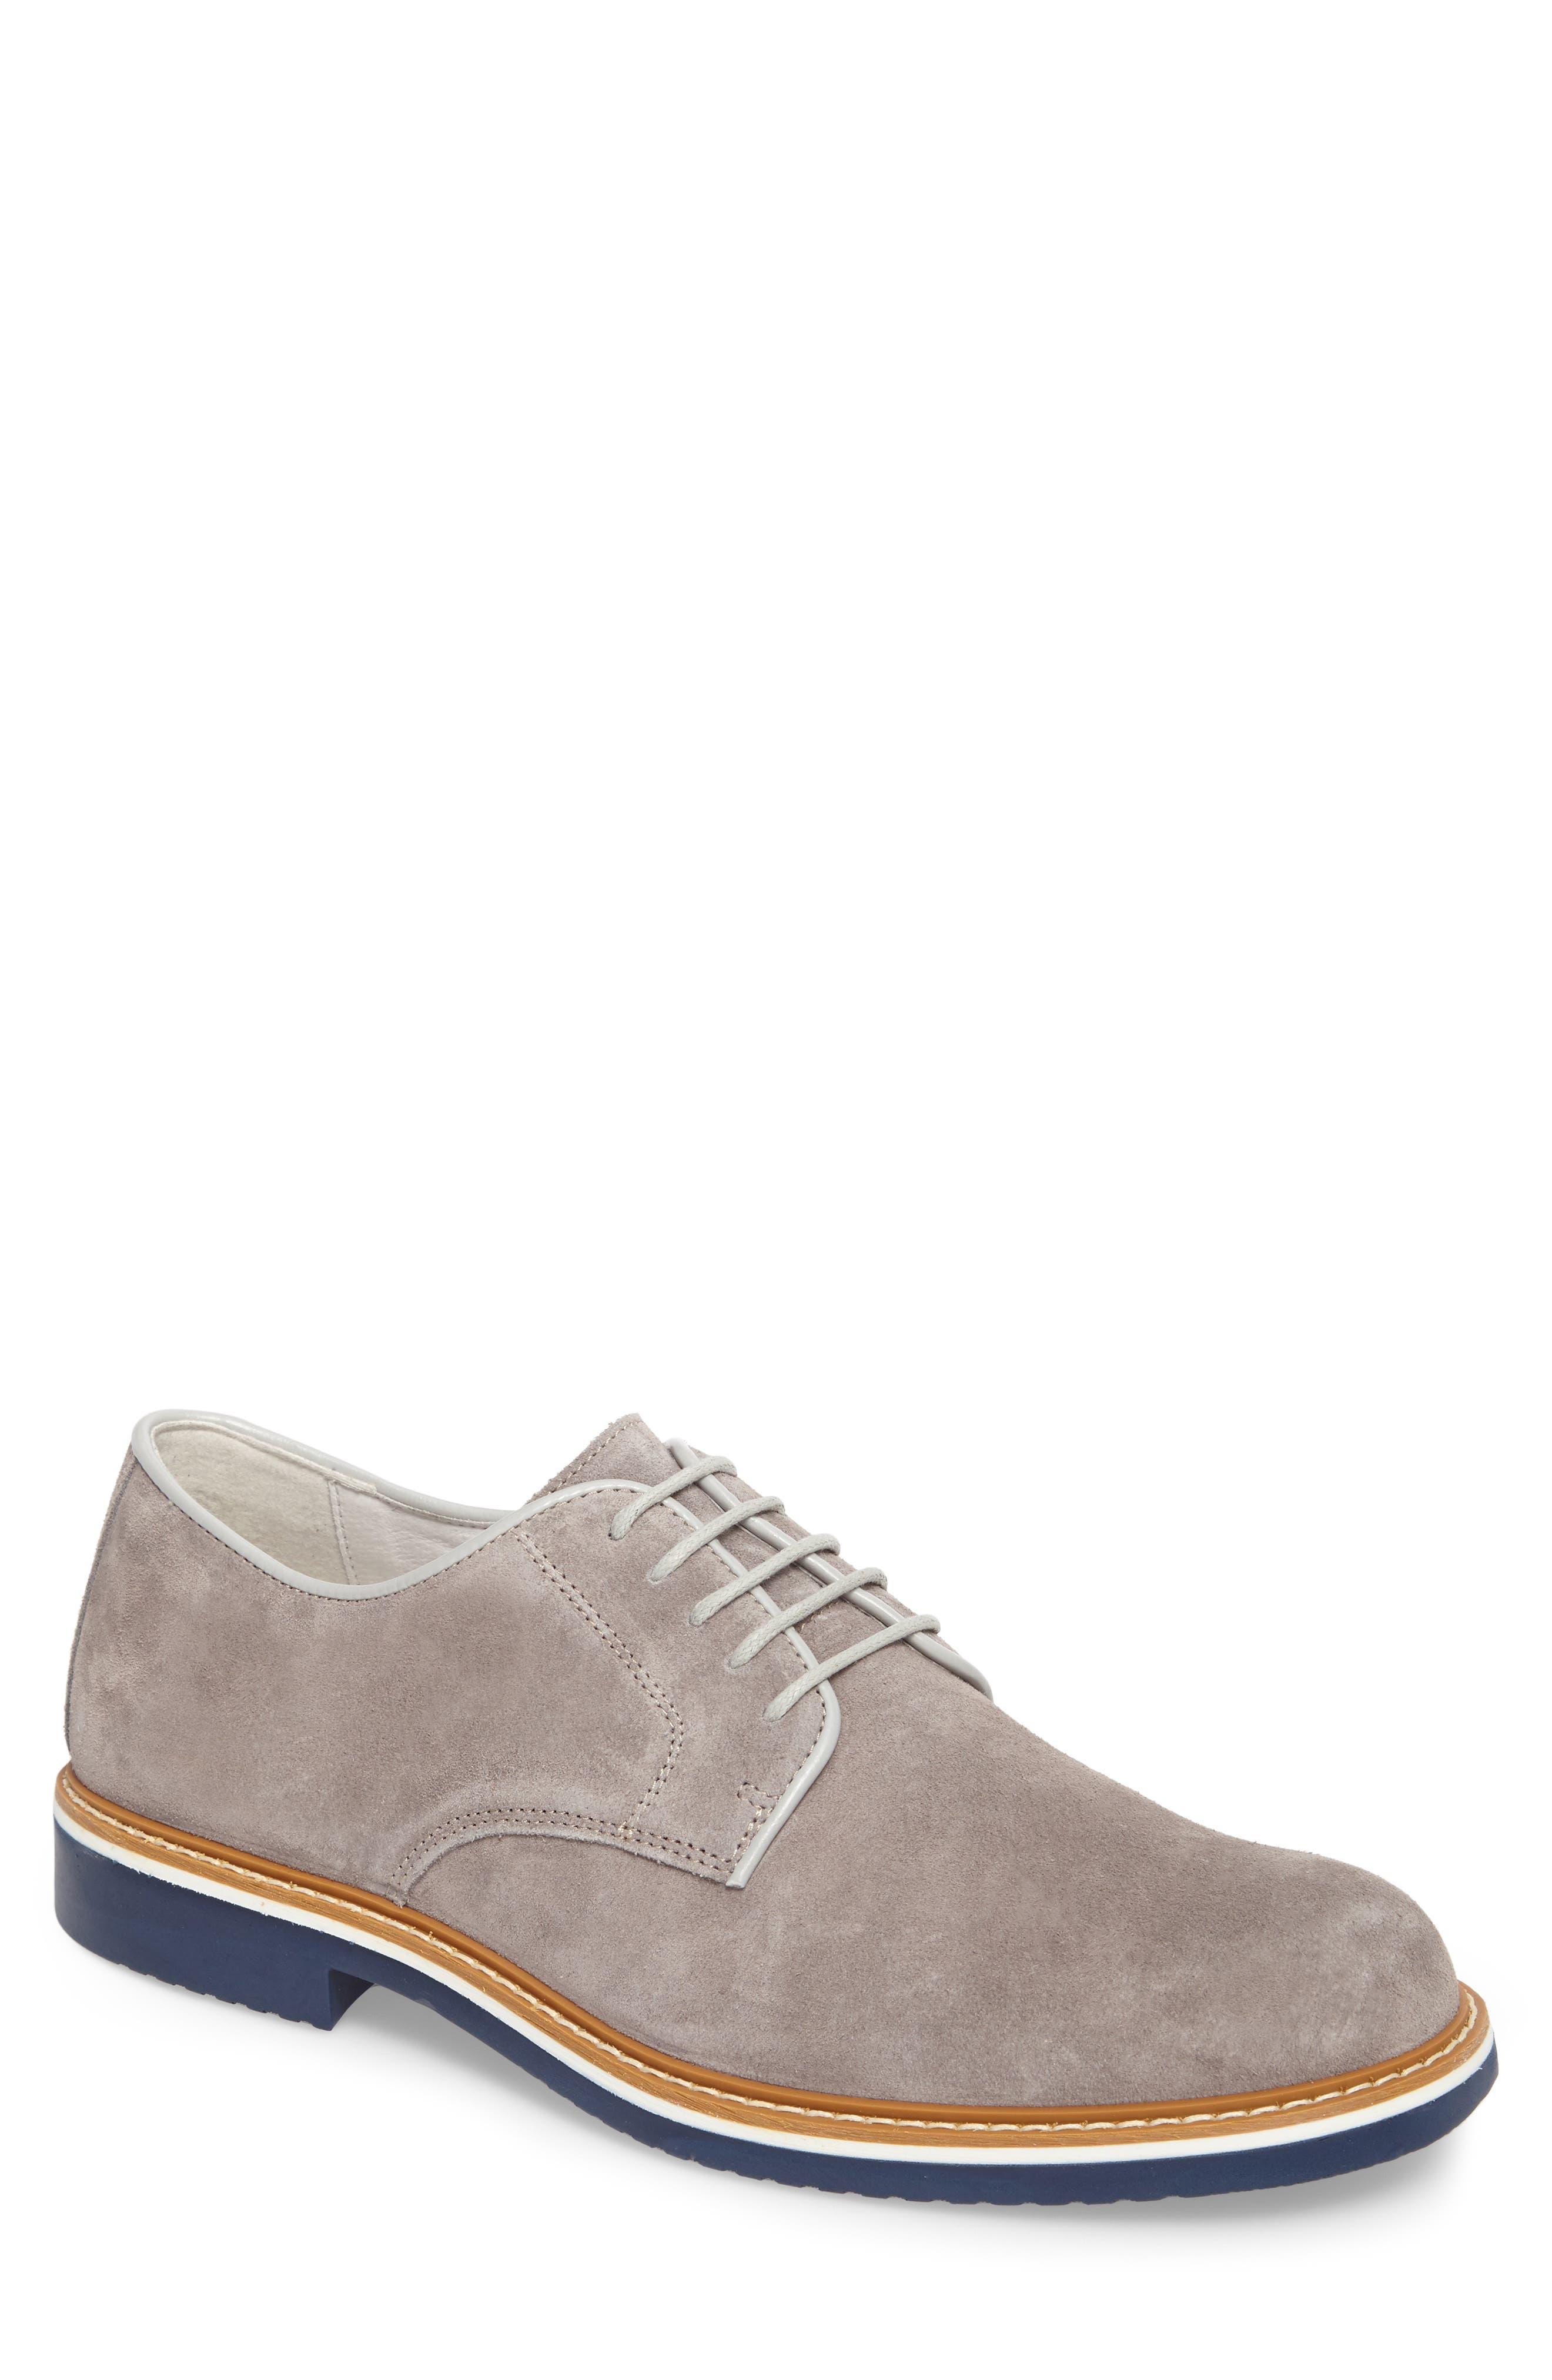 Cardiff Plain Toe Derby,                         Main,                         color, Grey Suede